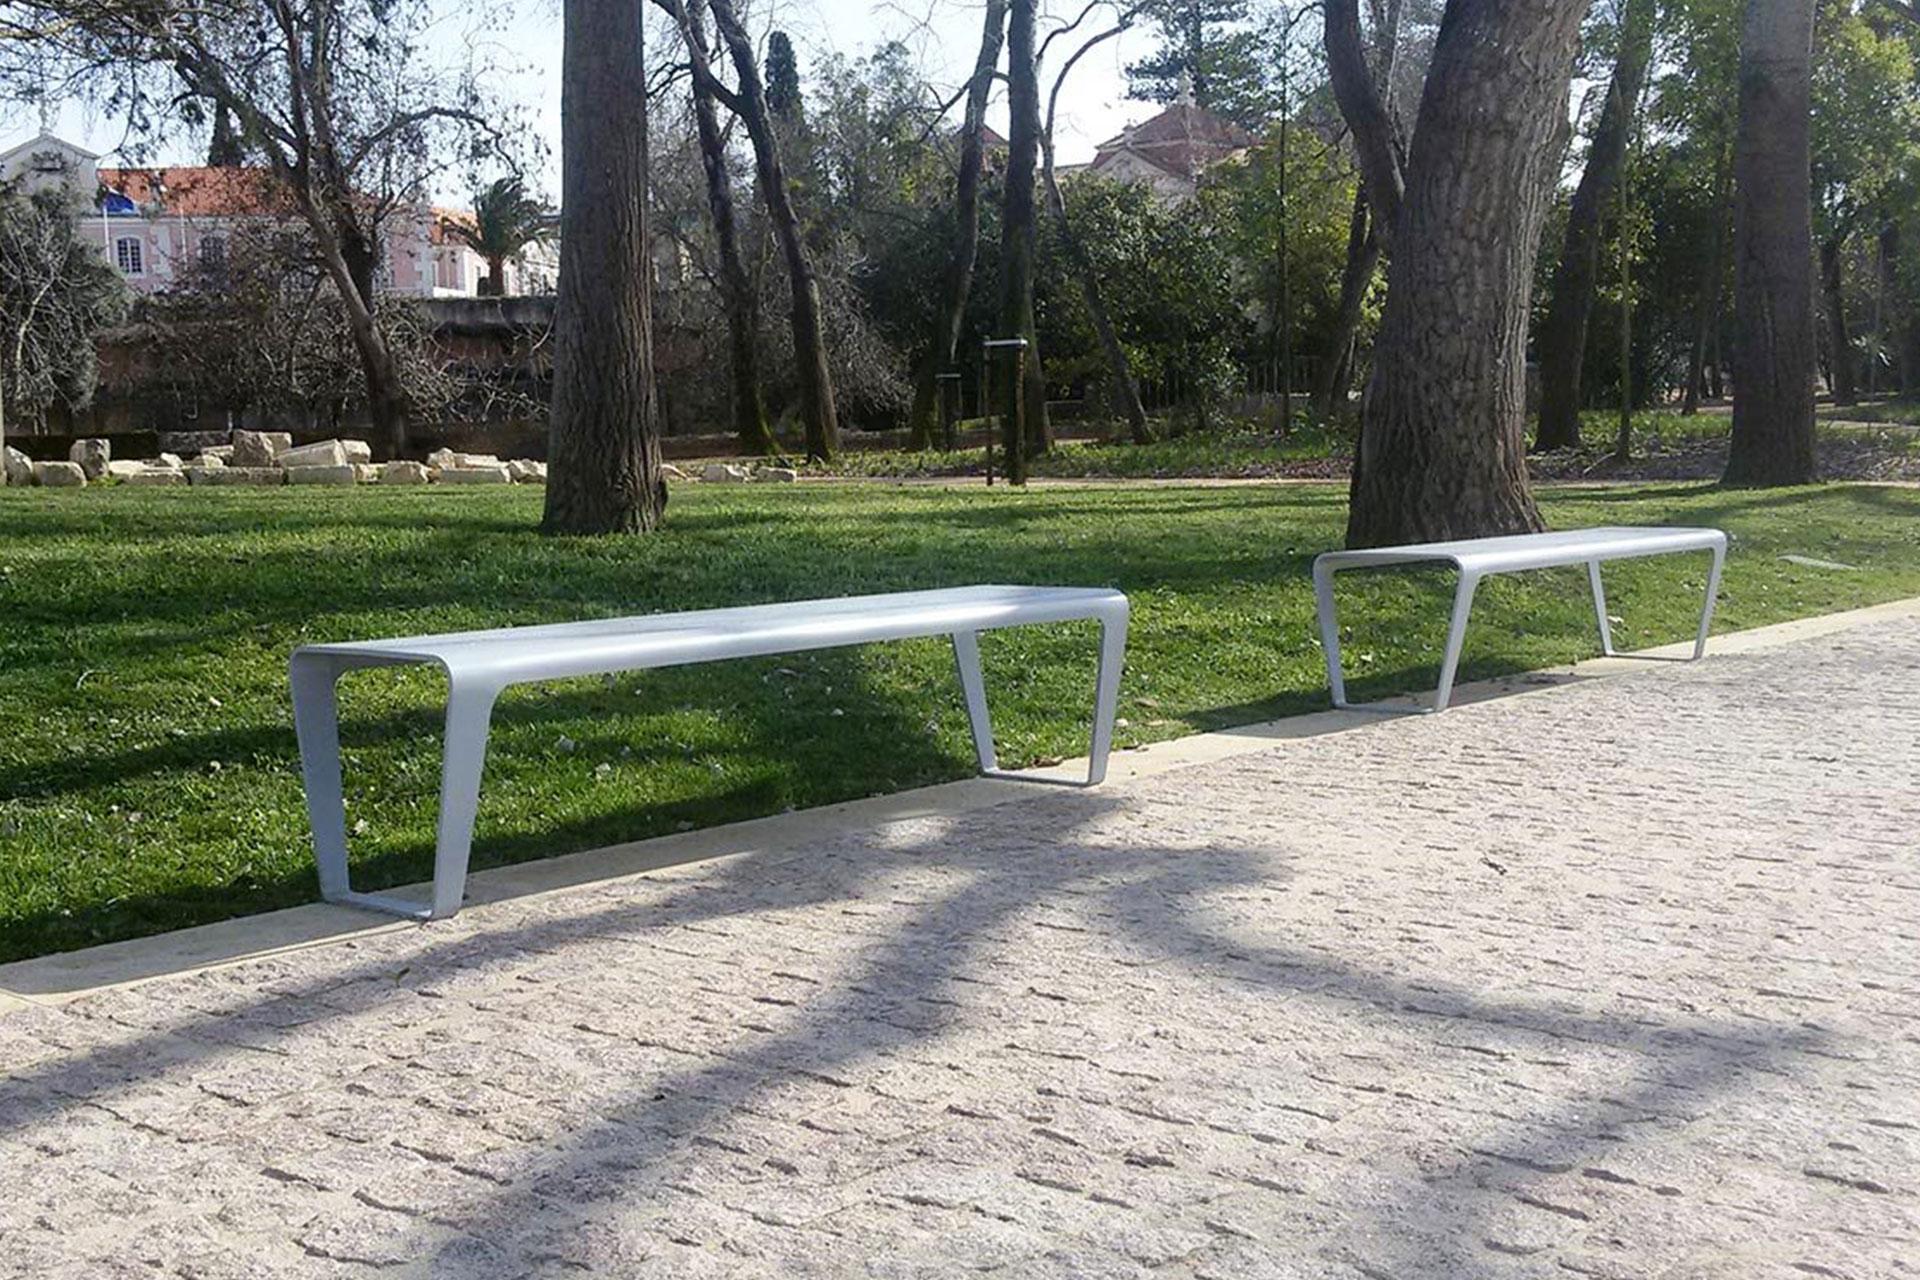 UrbanObjekts Filipe Sitzgelegenheit